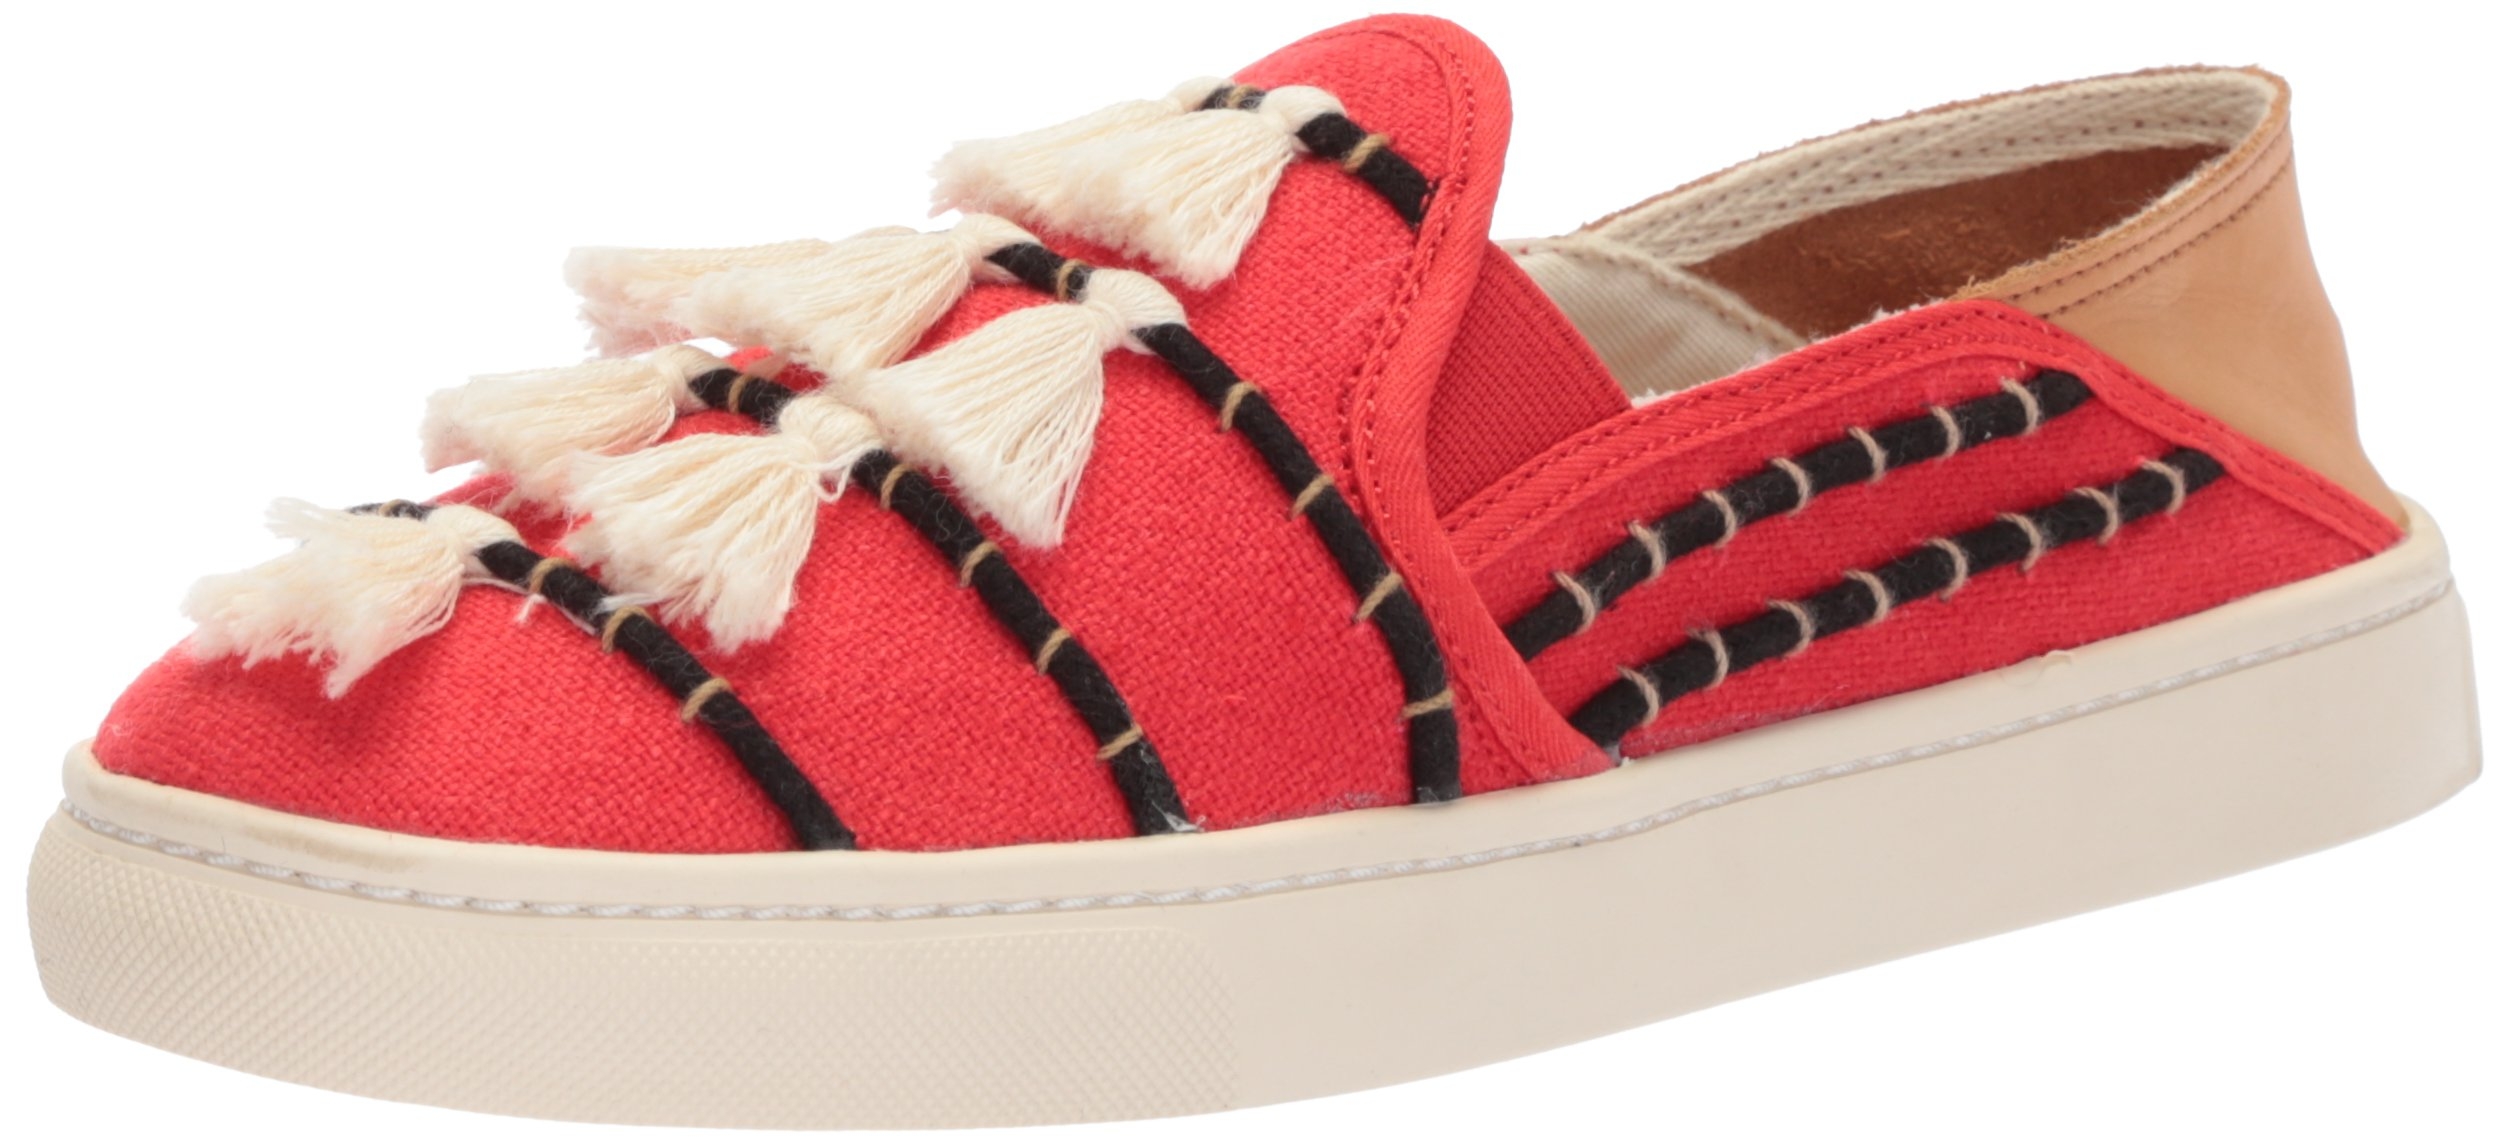 Soludos Women's Tassel Slip Sneaker, Red/Beige, 8 B US